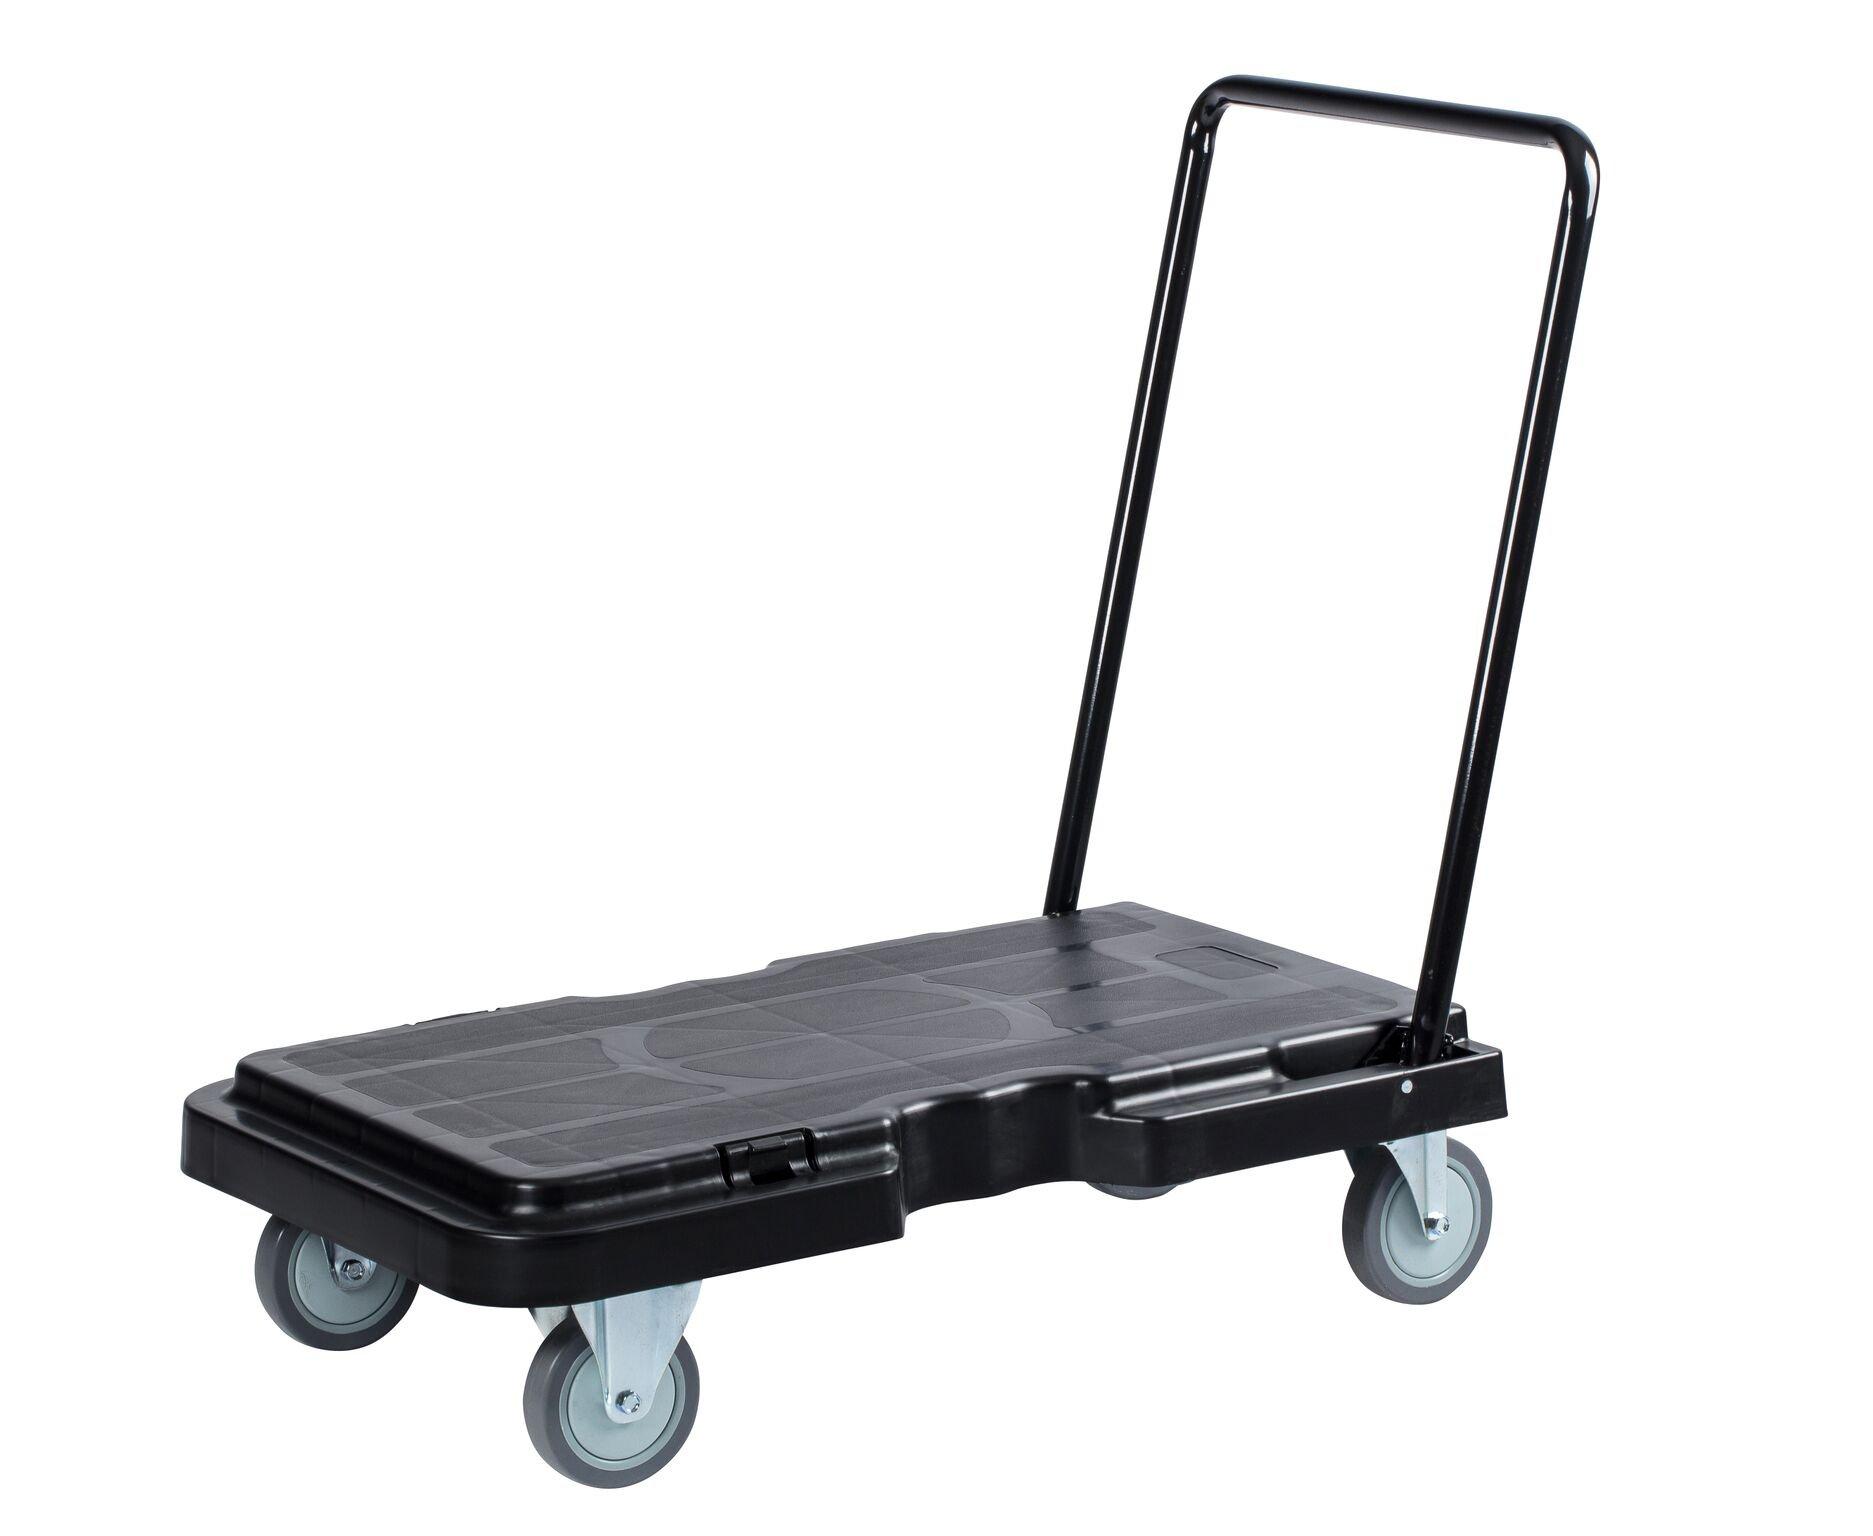 Janico 1059 Folding Platform Cart - Industrial Dolly Foldable Moving Warehouse Push Hand Truck, Black by Janico